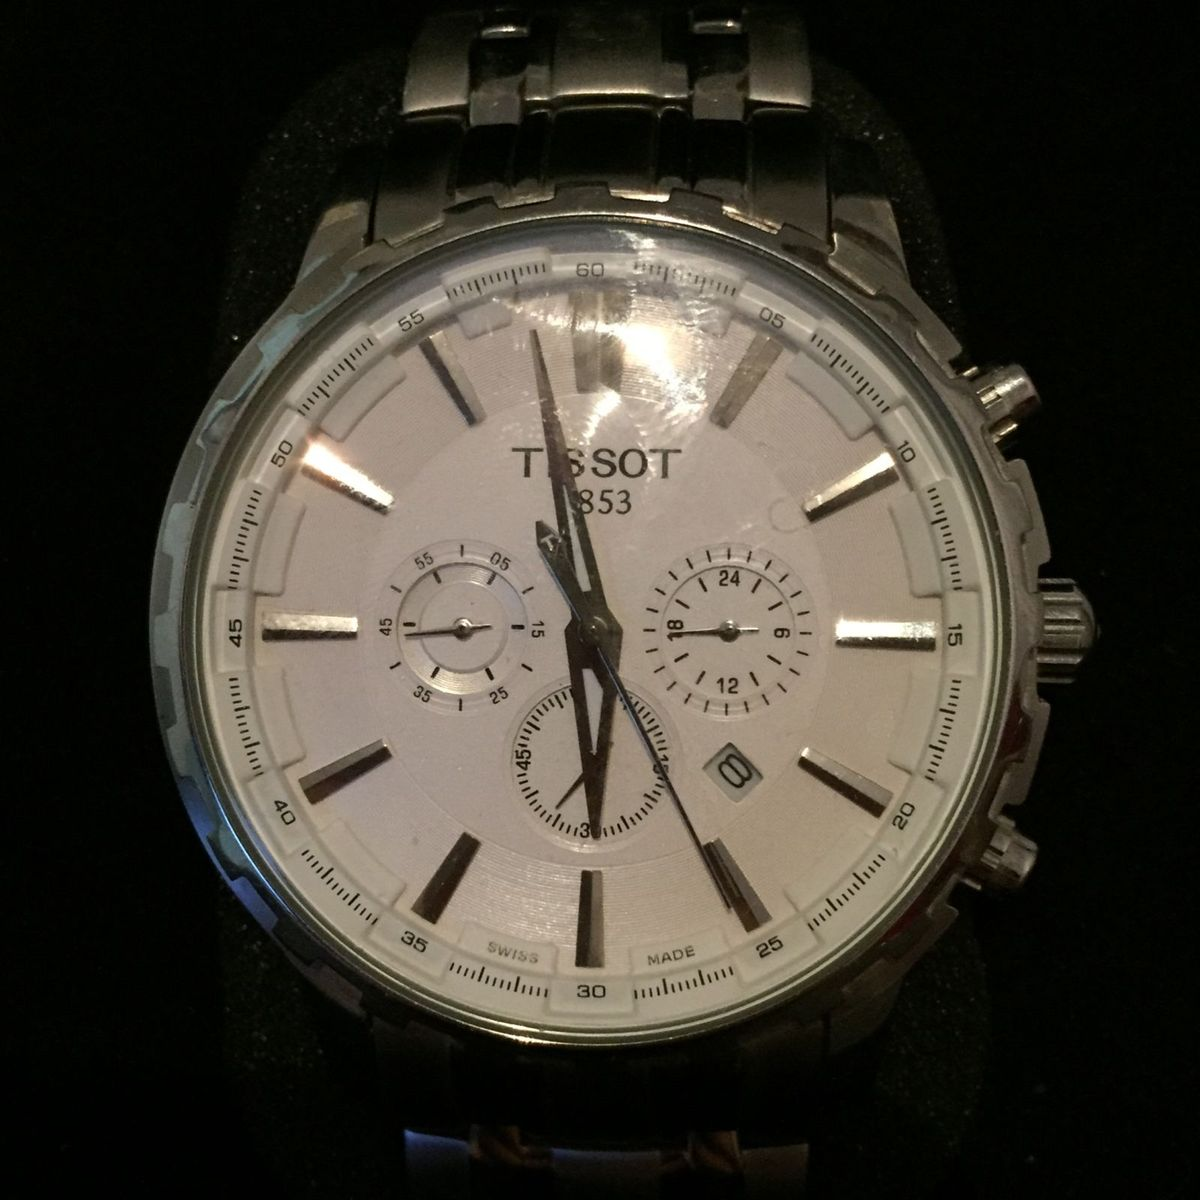 80313a85352 Relógio Tissot 1853